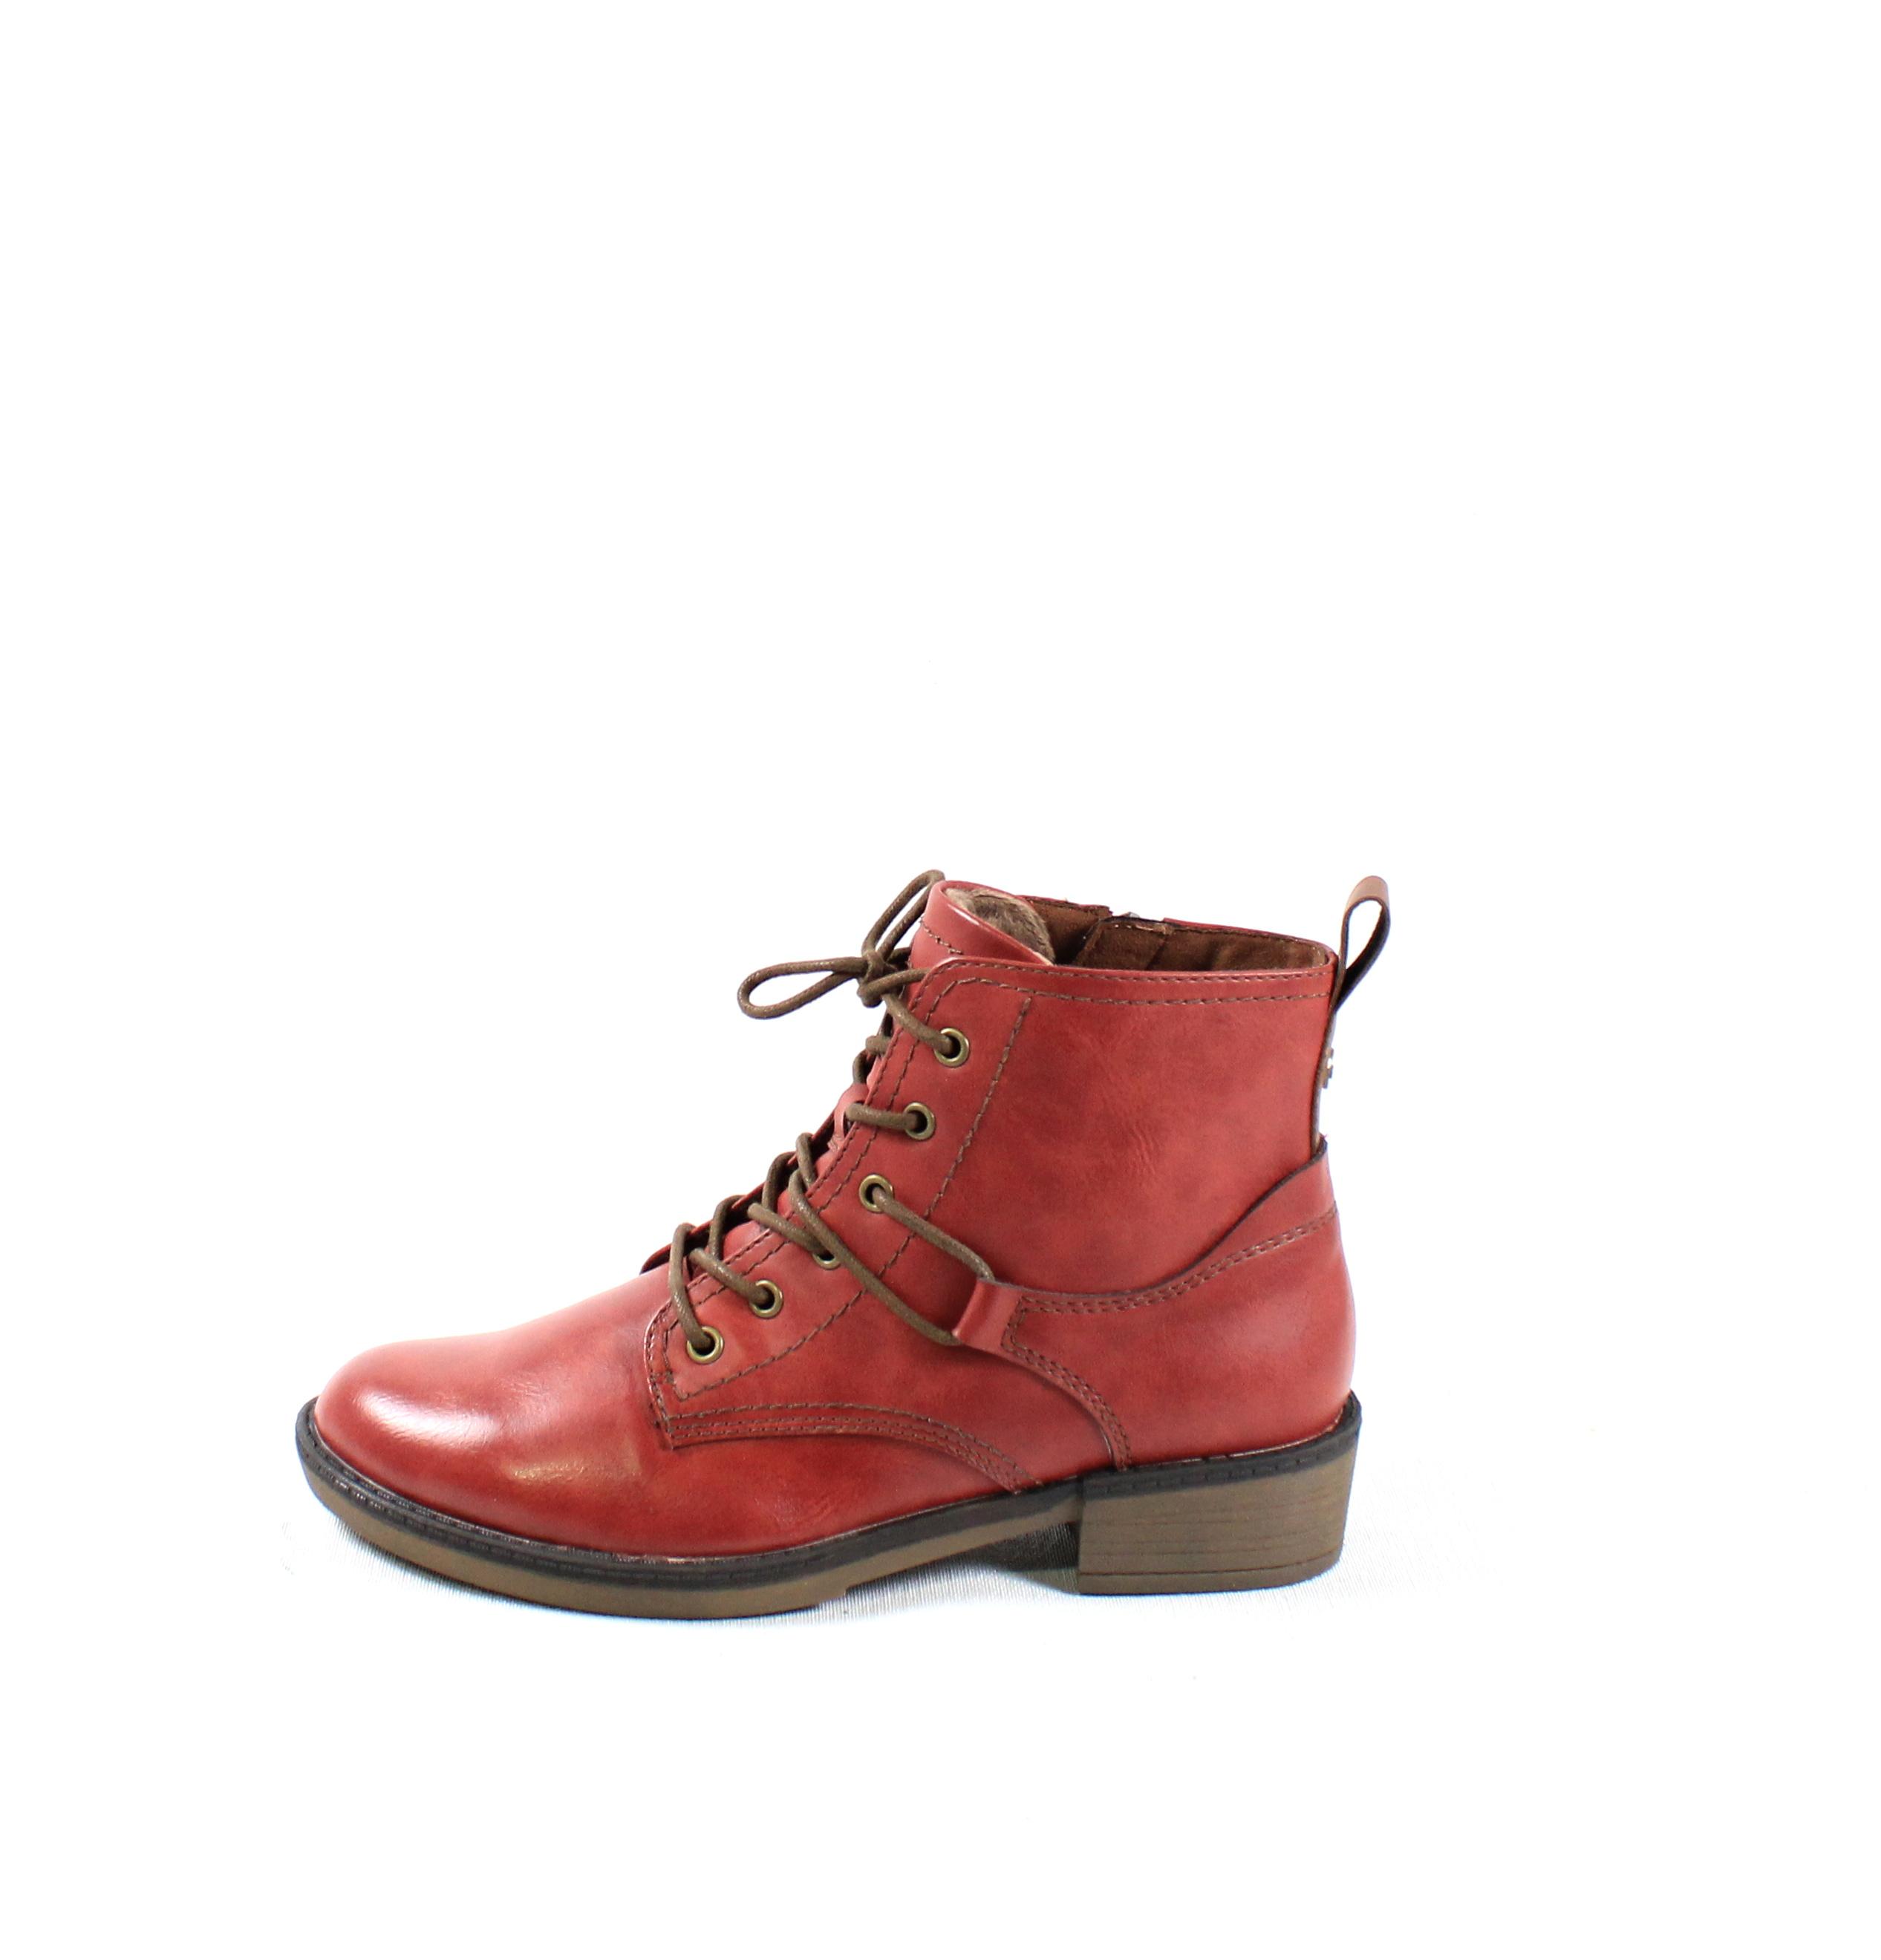 f3298d7b5908 Dámska členková obuv TAMARIS 1-25116-21 SANGRIA – Topánky Olympia shoes